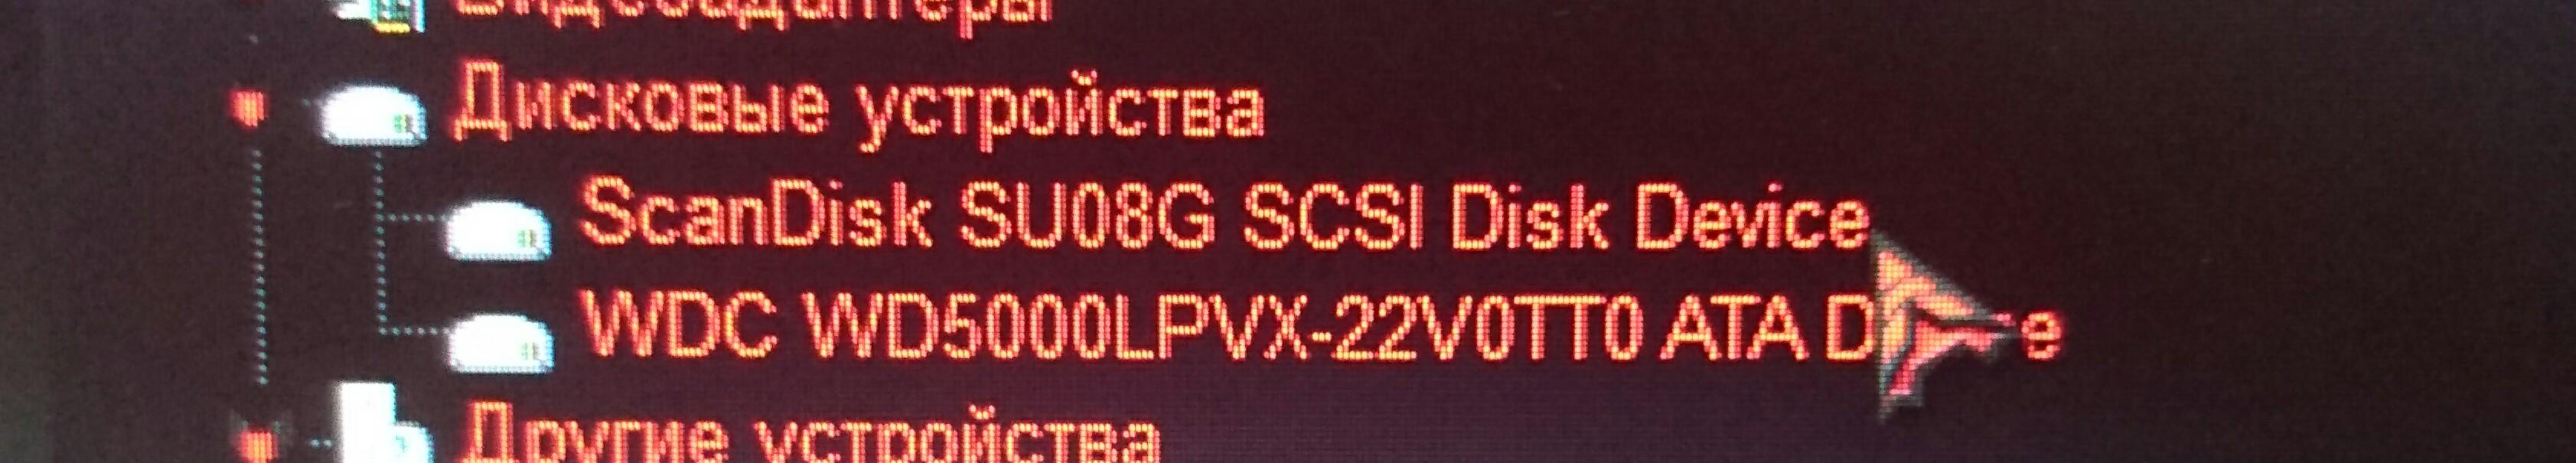 acpi 80860f14 driver windows 7 64